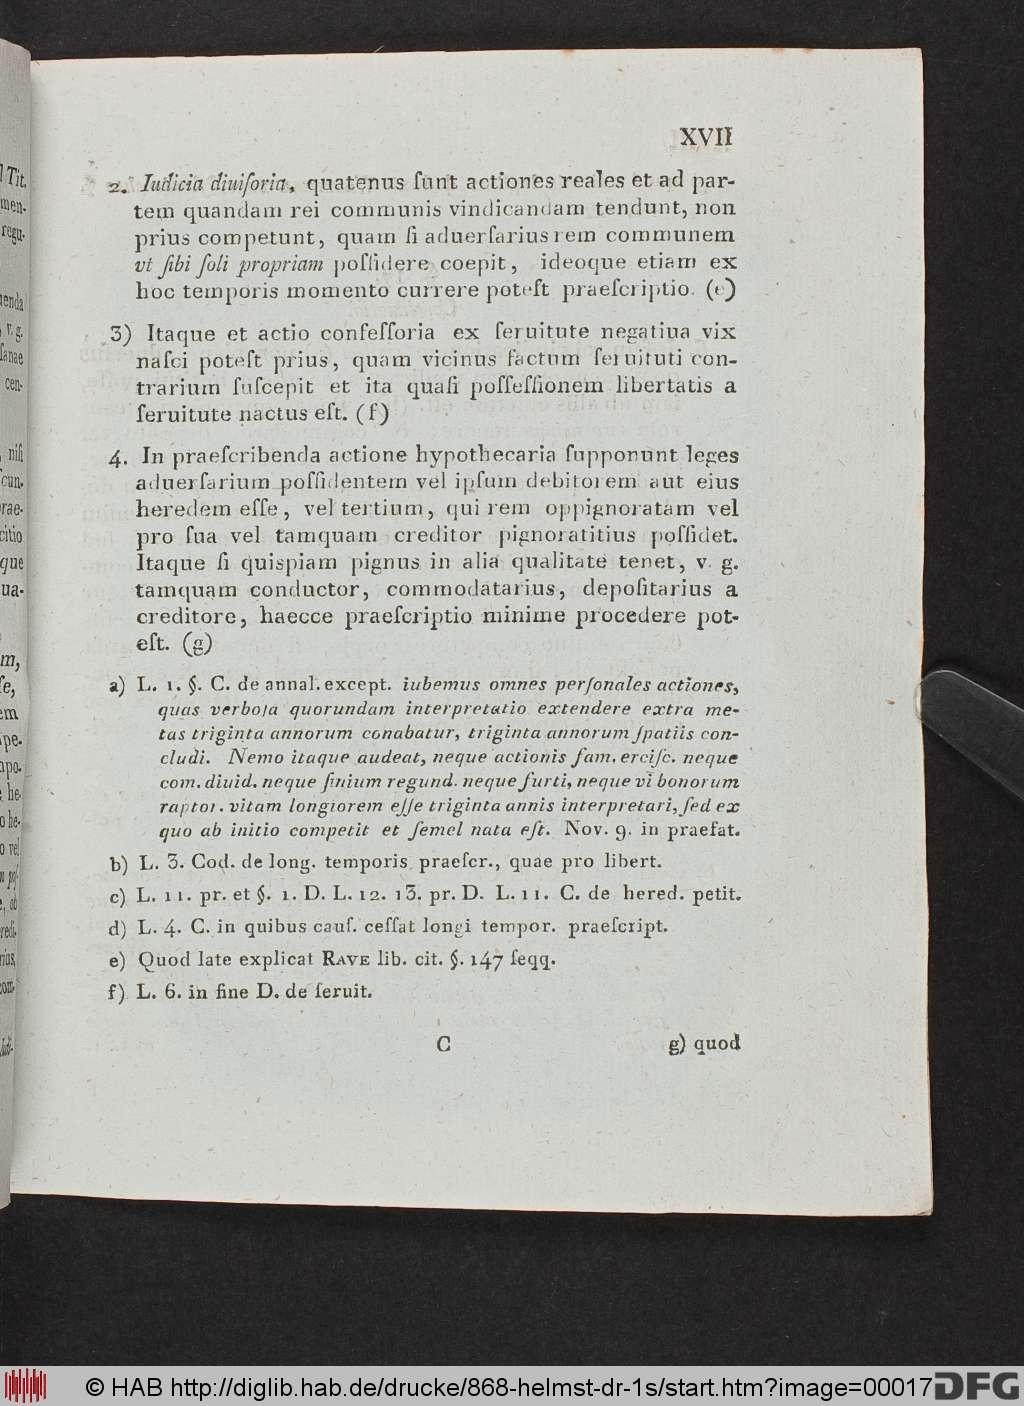 https://diglib.hab.de/drucke/868-helmst-dr-1s/00017.jpg